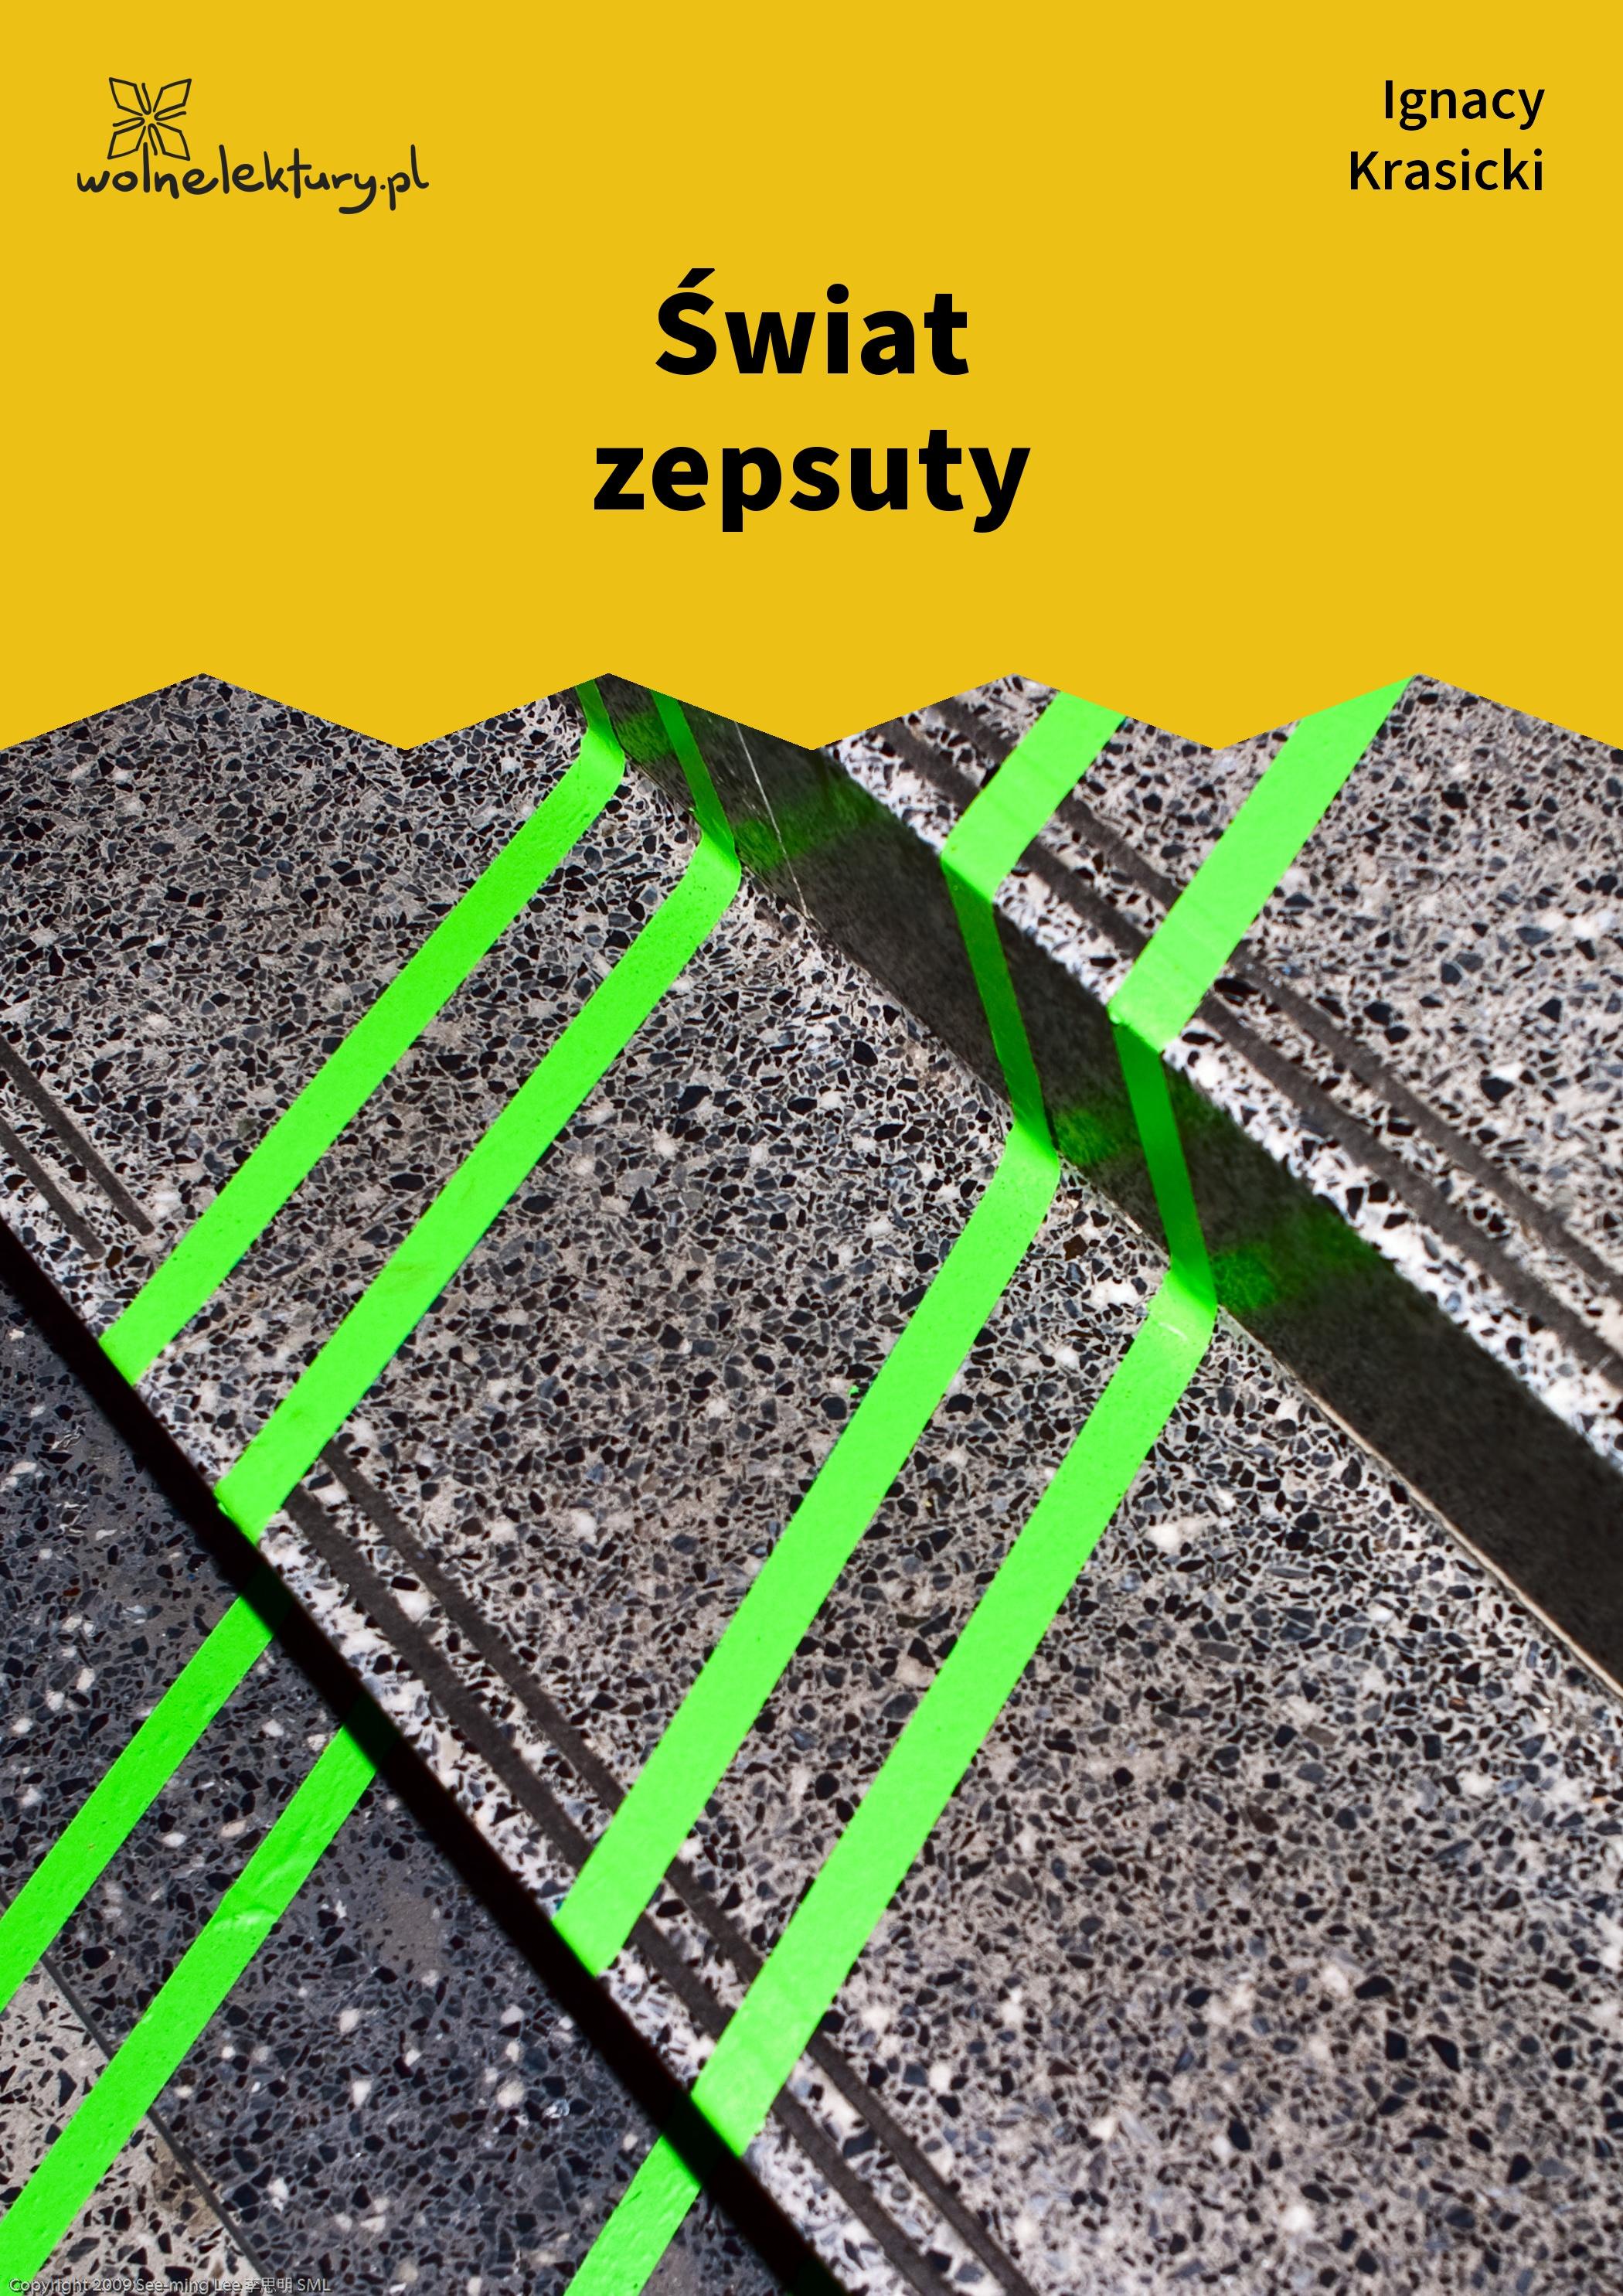 Medaliony pdf wolne lektury pl